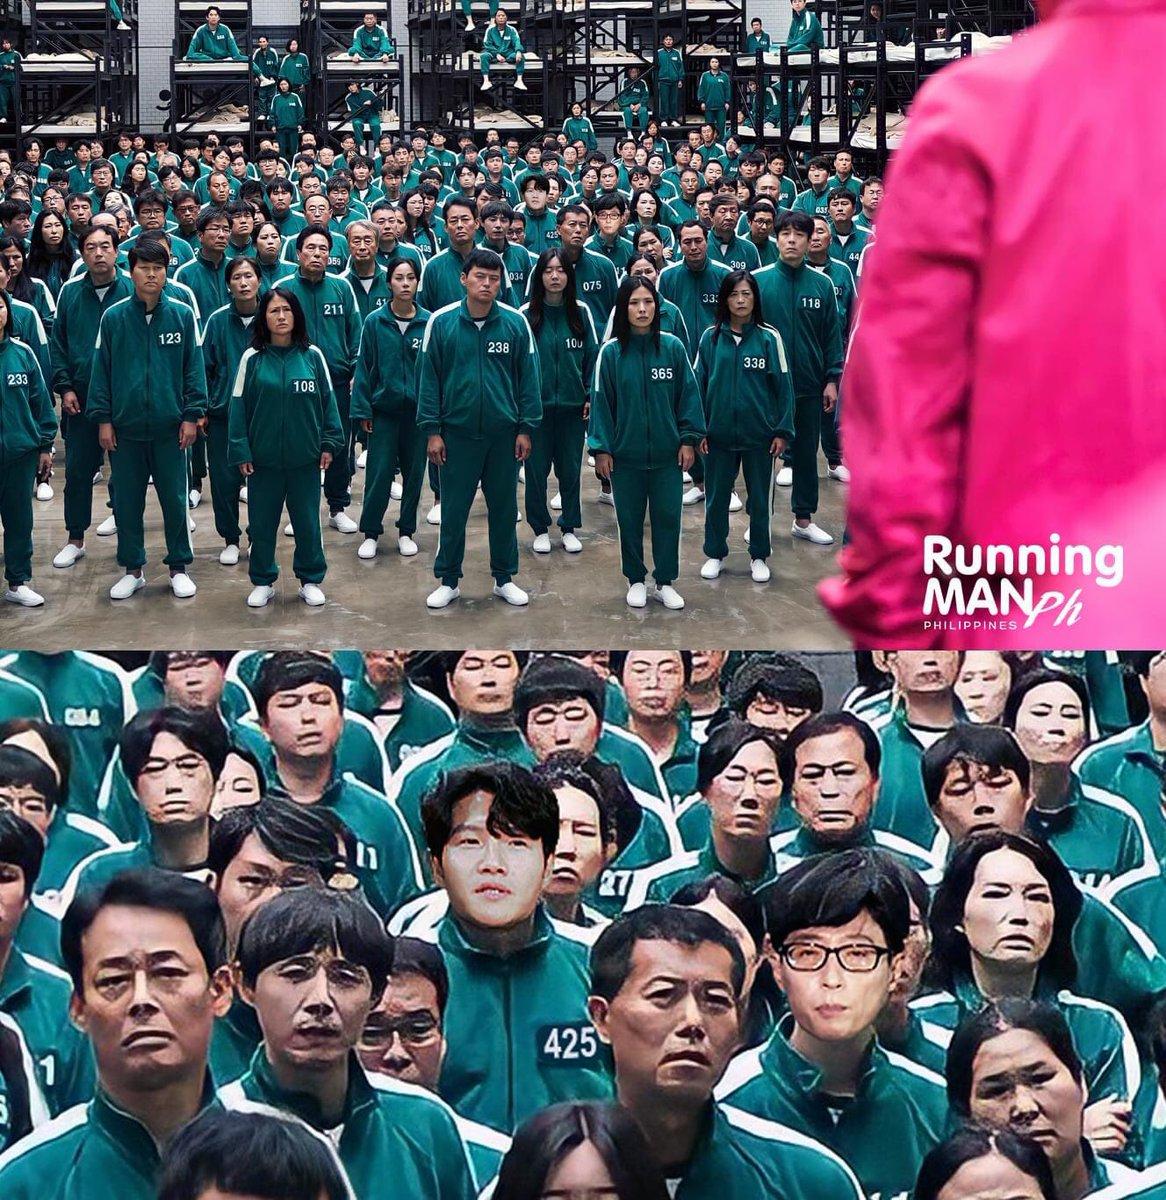 The cameo we didn't know we needed.. 😆  #runningman #SquidGame #전소민 #kimjongkook #yoojaesuk #유재석 #김종국